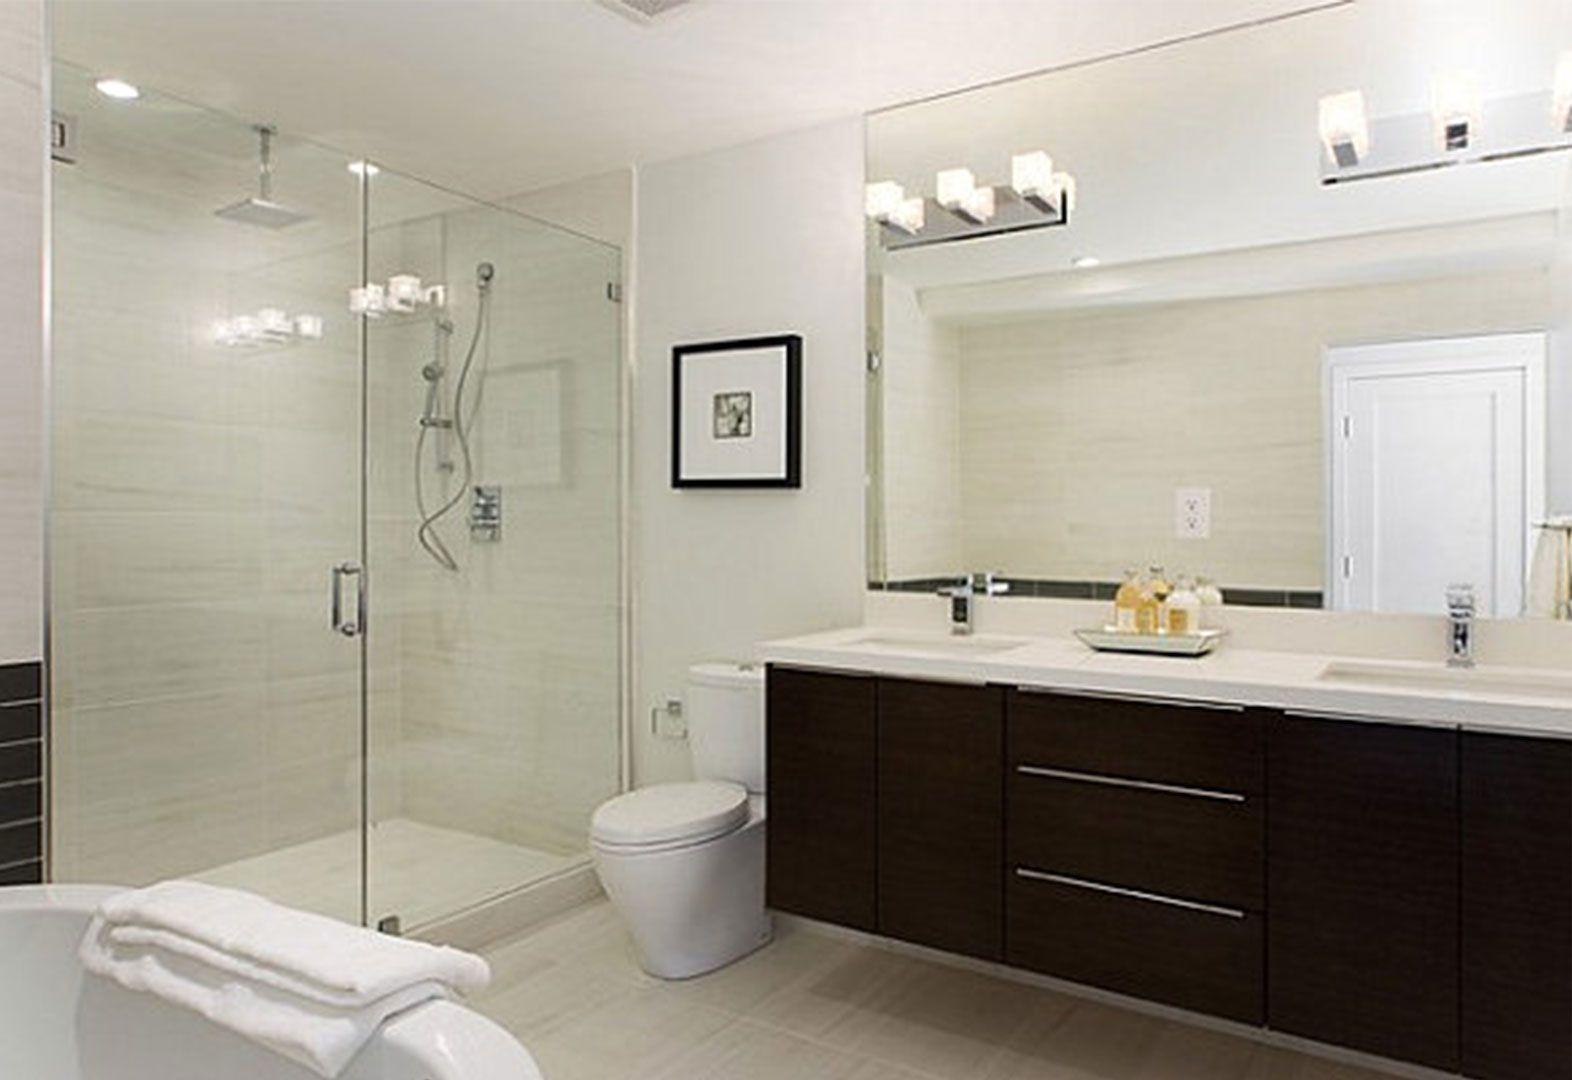 Bathroom Sconce with Night Light House Interior Design